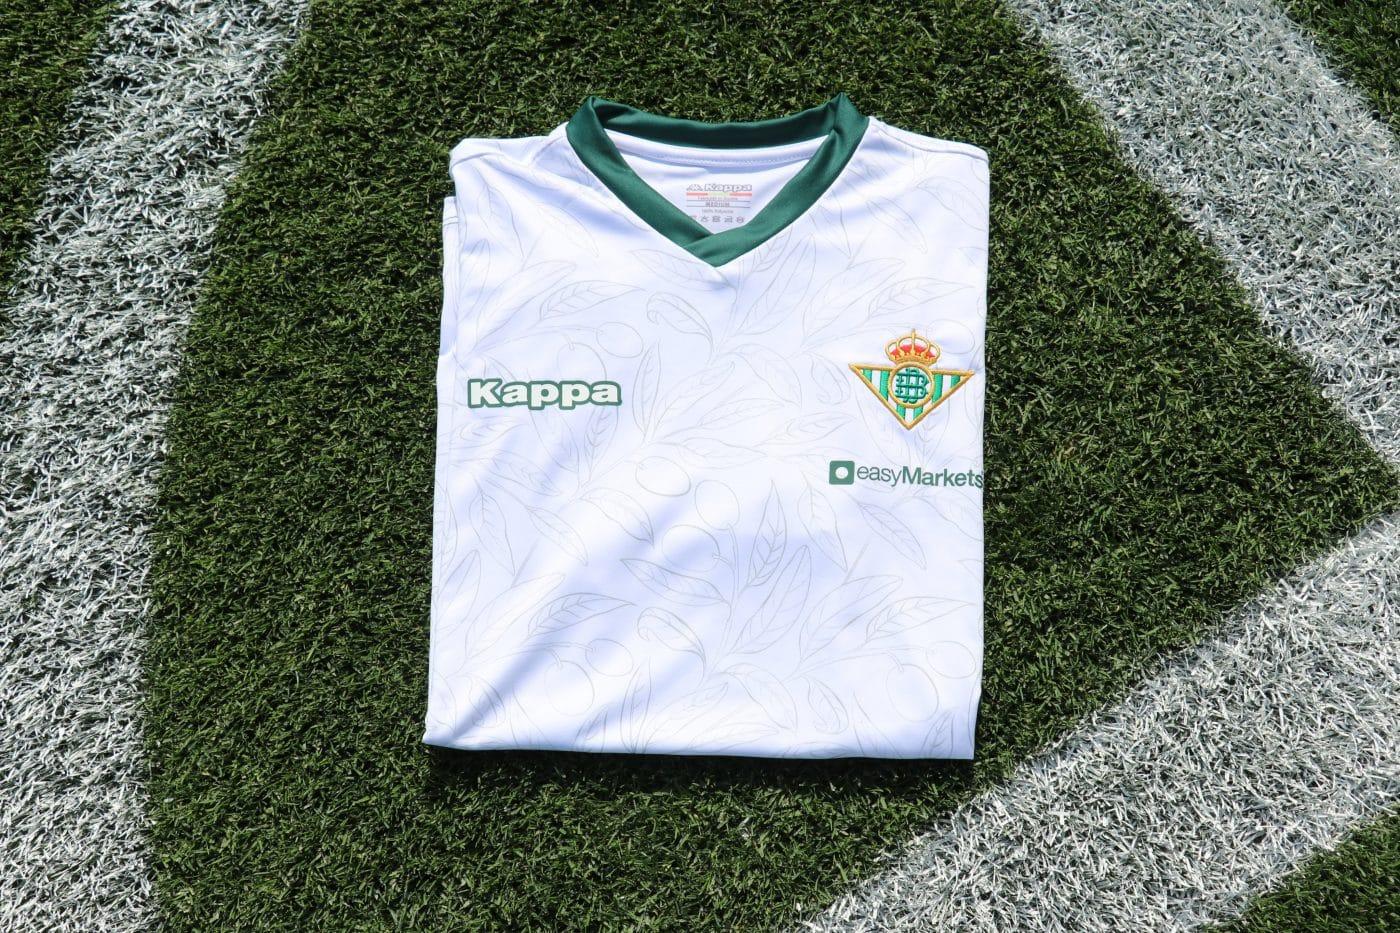 maillot-betis-seville-journee-de-andalousie-kappa-2